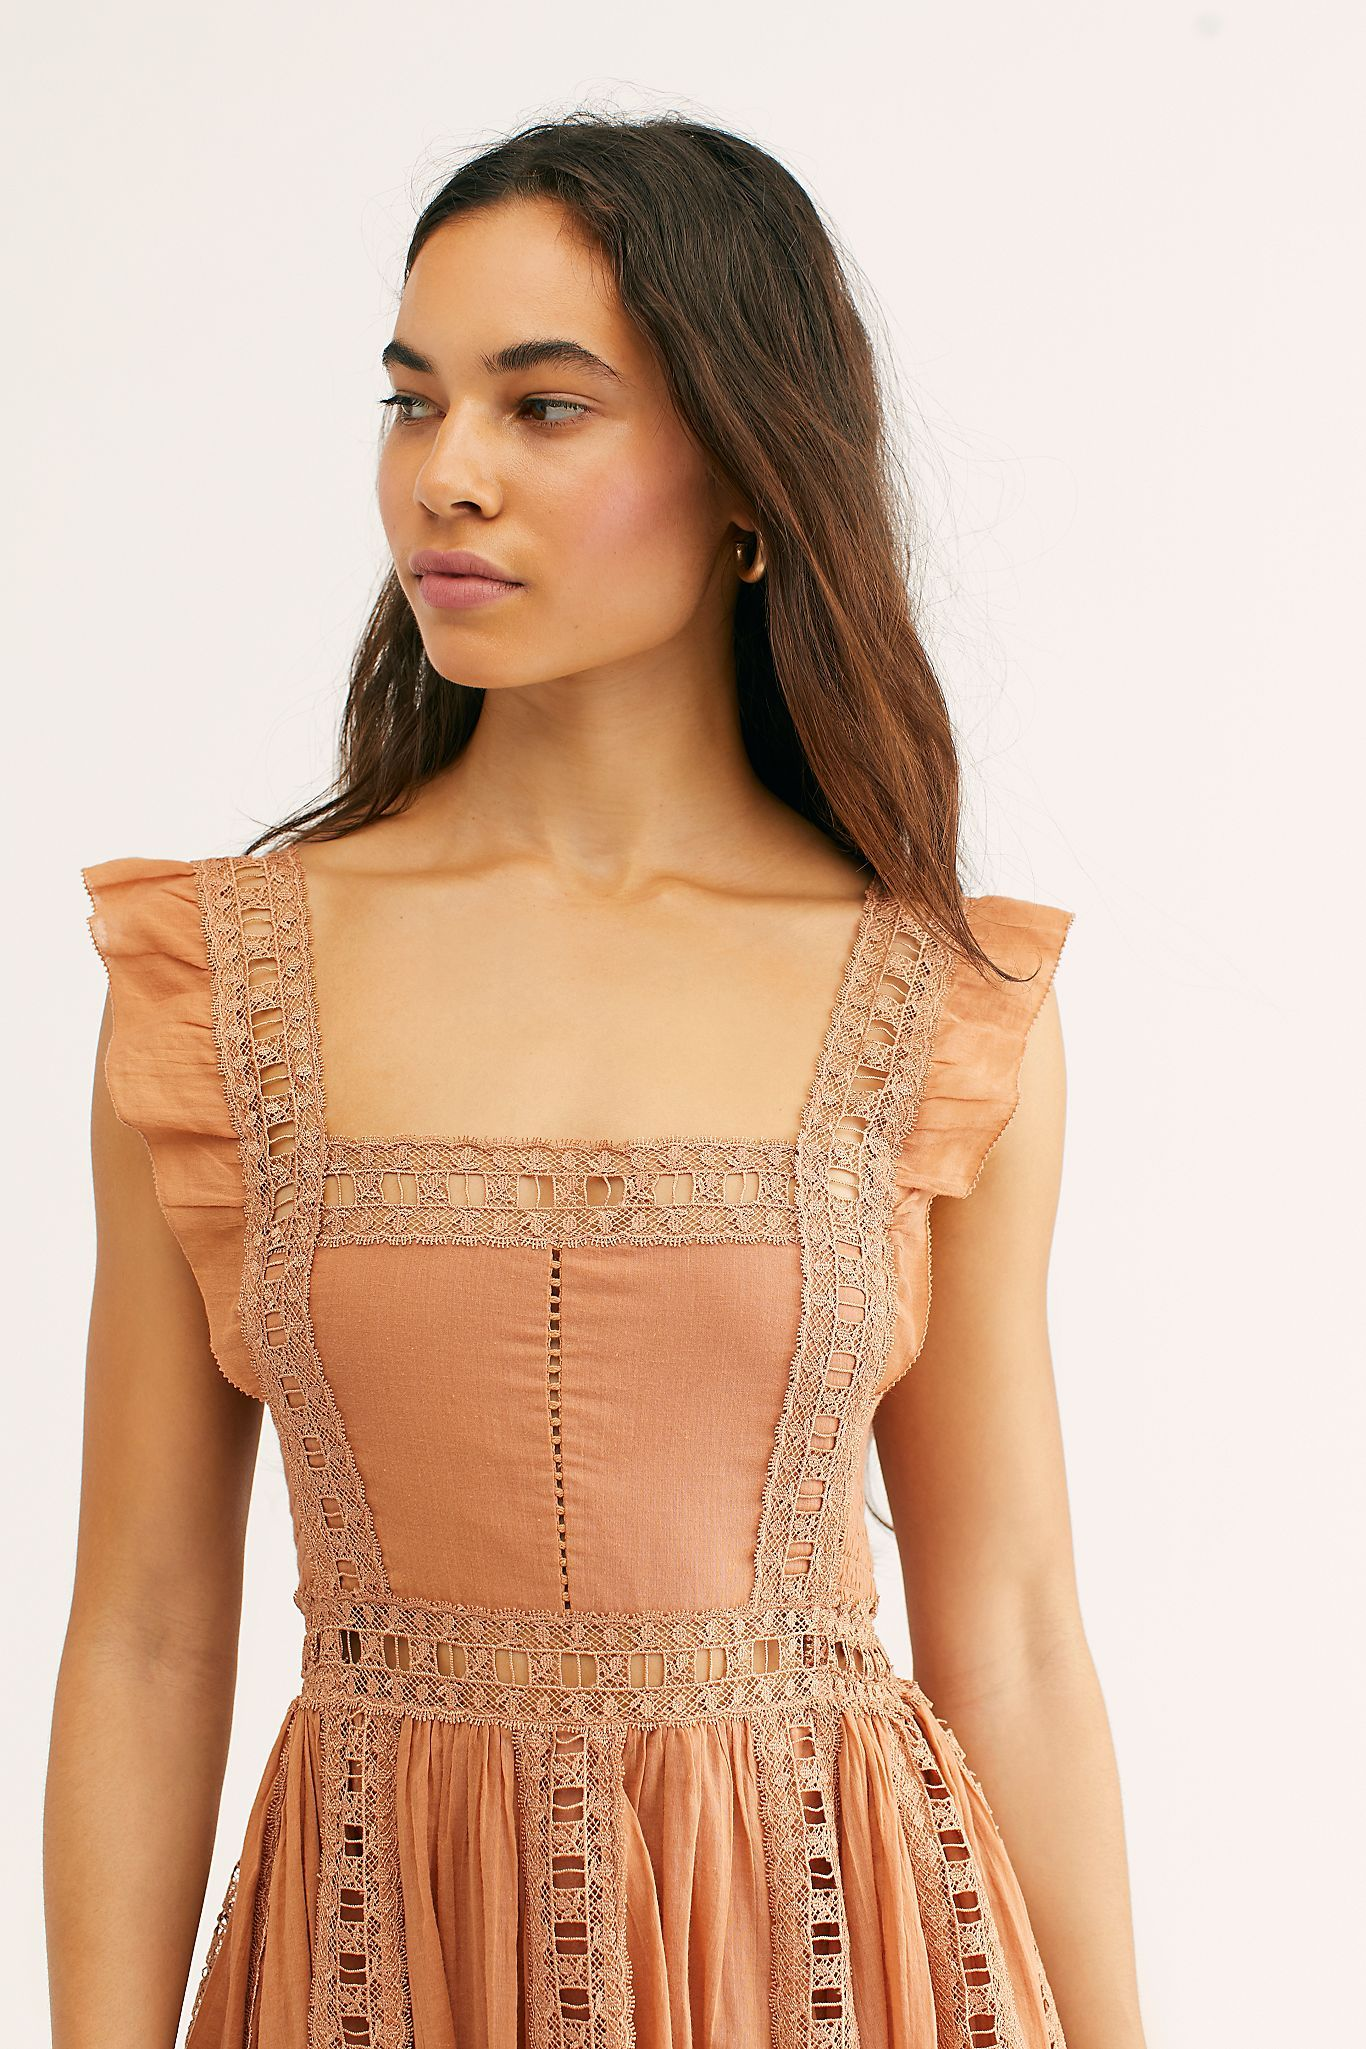 Lucky Slip Dresses Long Sleeve Embroidered Dress Mini Dress [ 2049 x 1366 Pixel ]